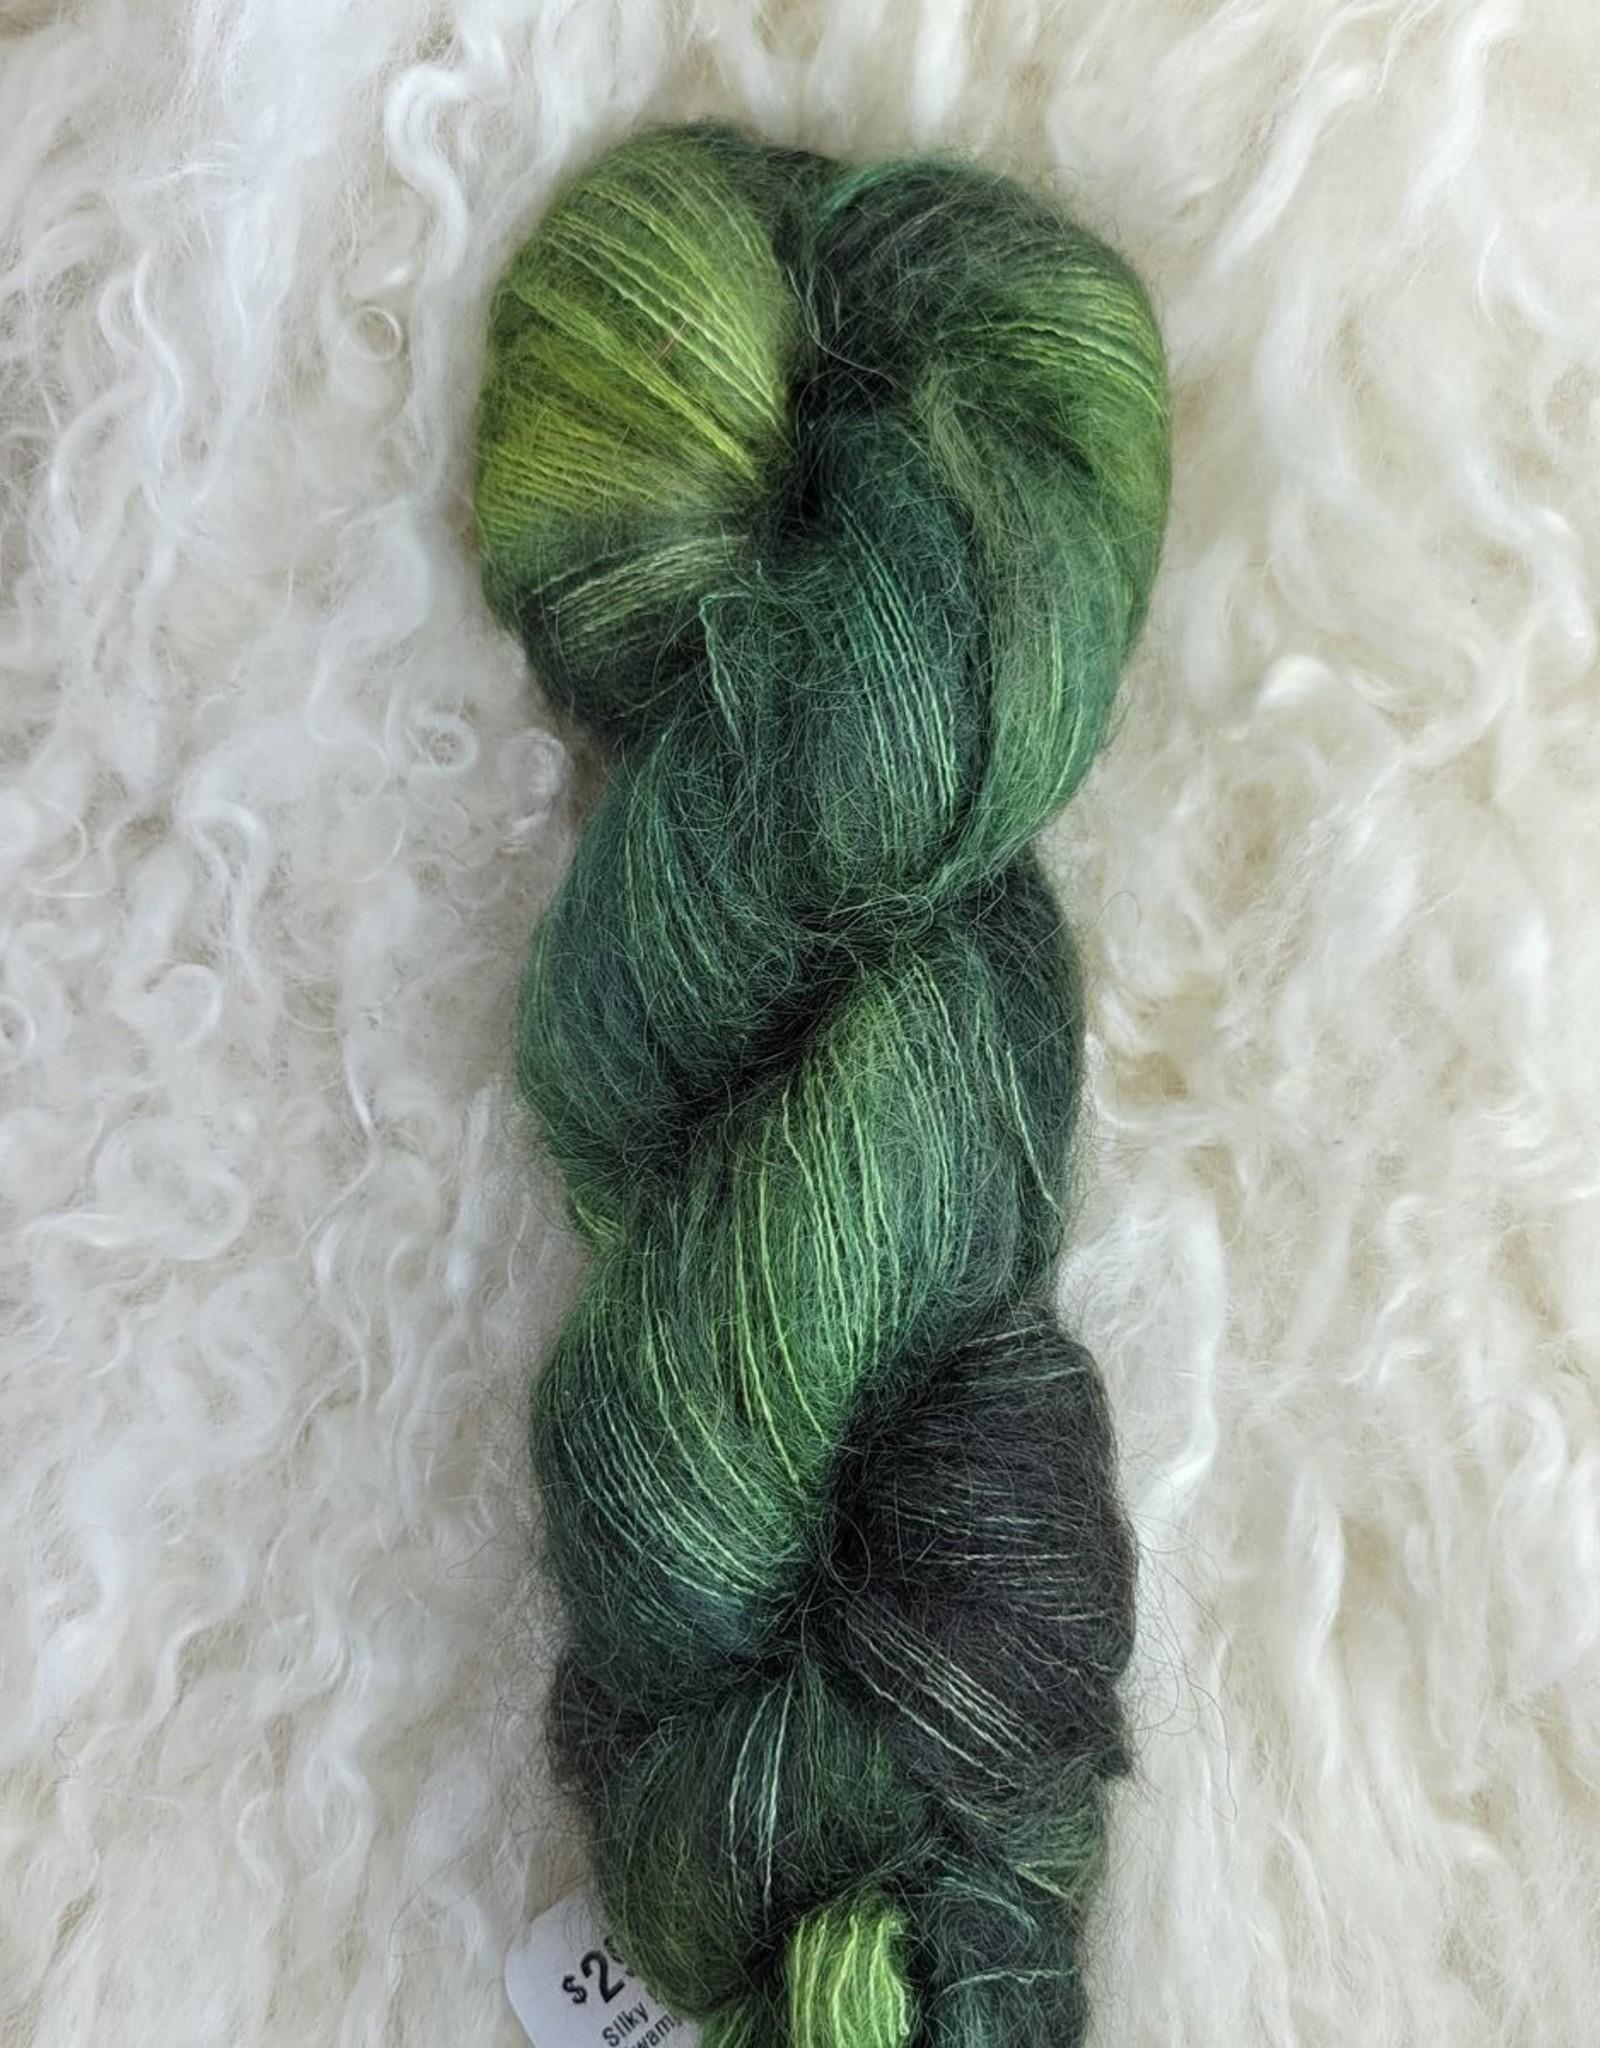 Palouse Yarn Co Silky Mo 50g Swamp Thing